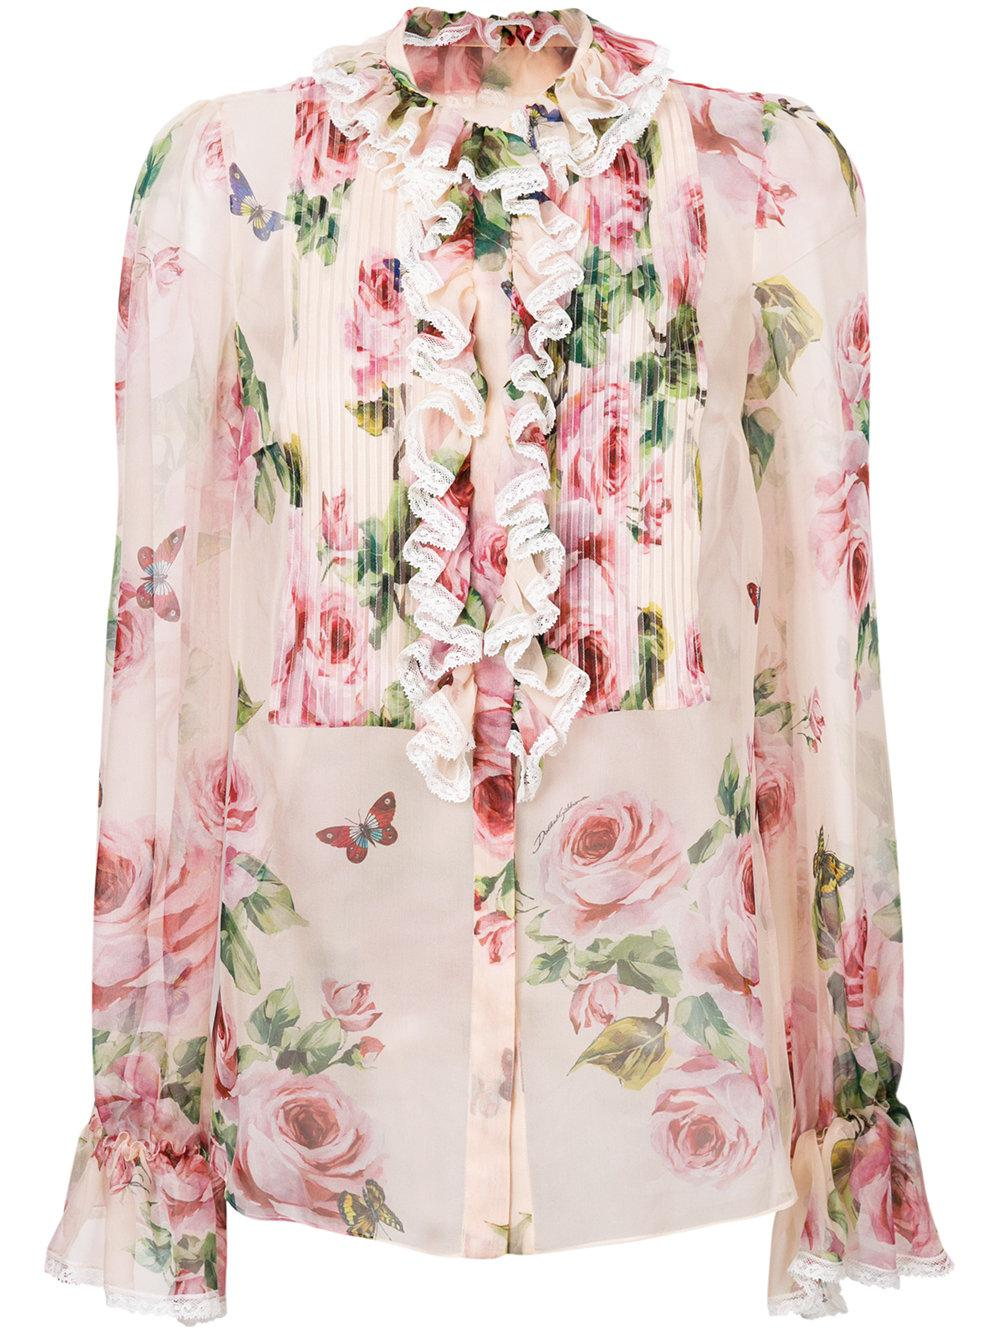 Lyst dolce gabbana flower print shirt in pink gallery mightylinksfo